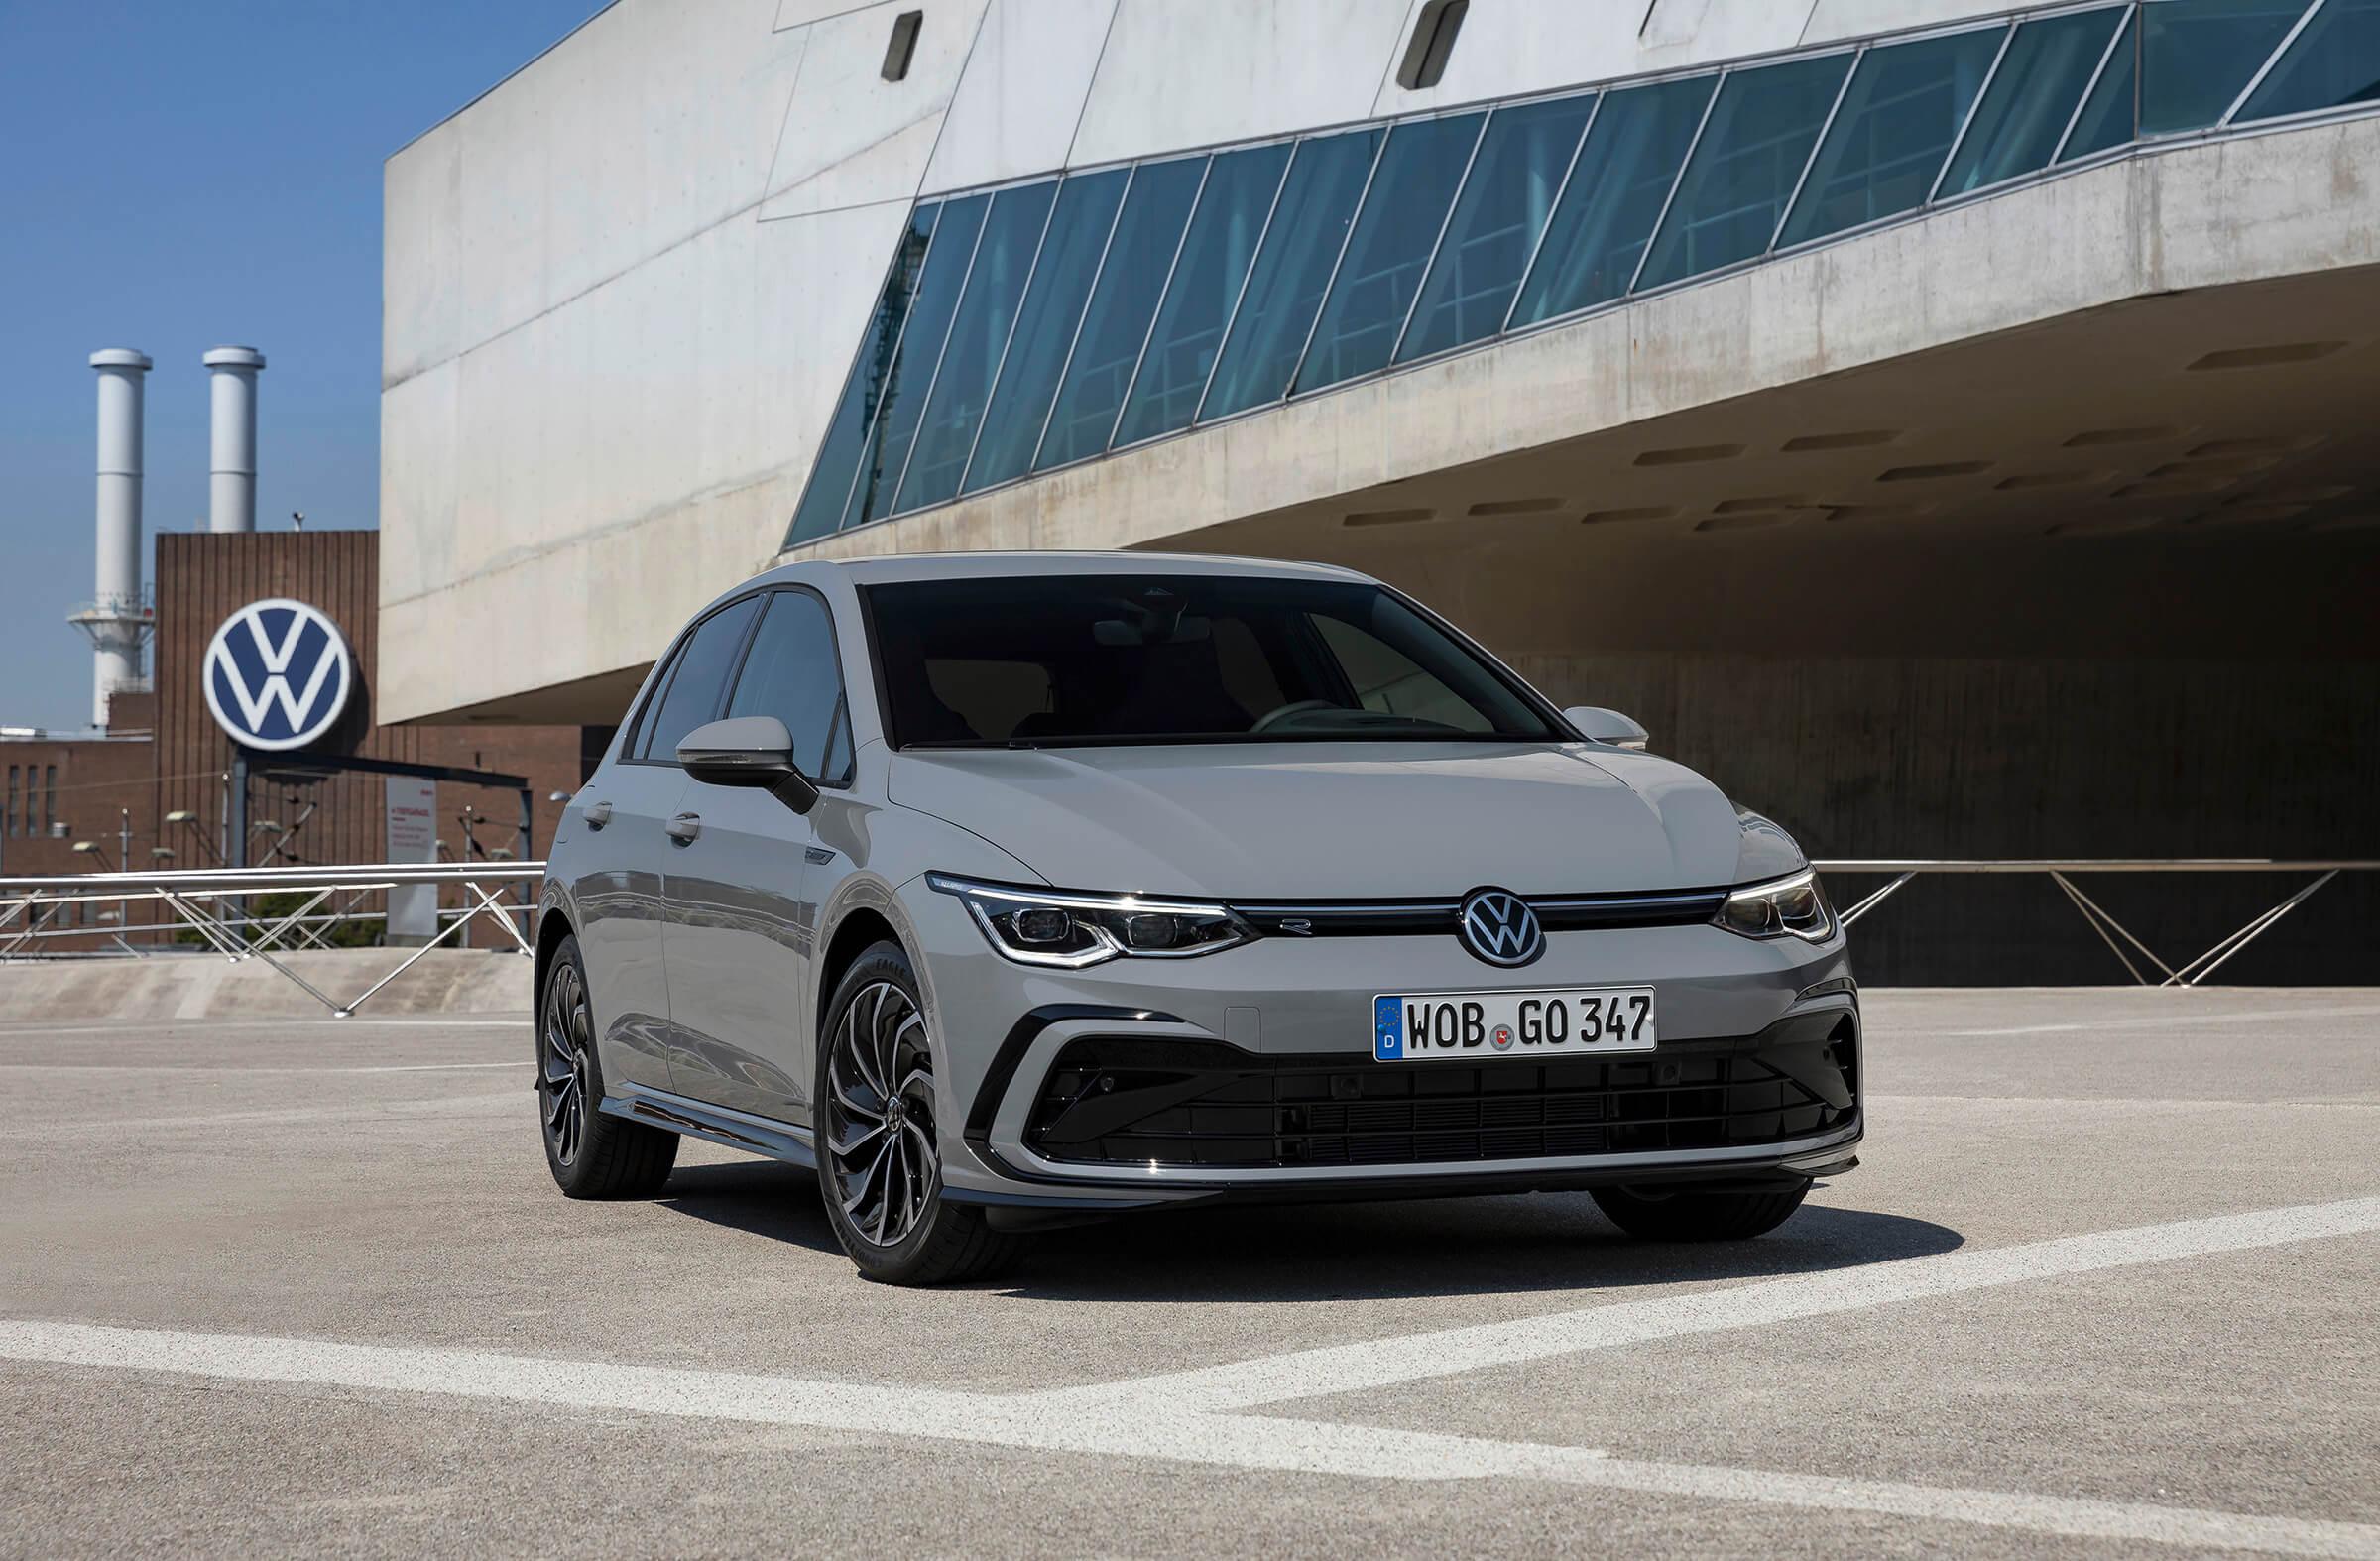 Volkswagen Golf - Νο1 στις πωλήσεις στην Ευρώπη για το 2020